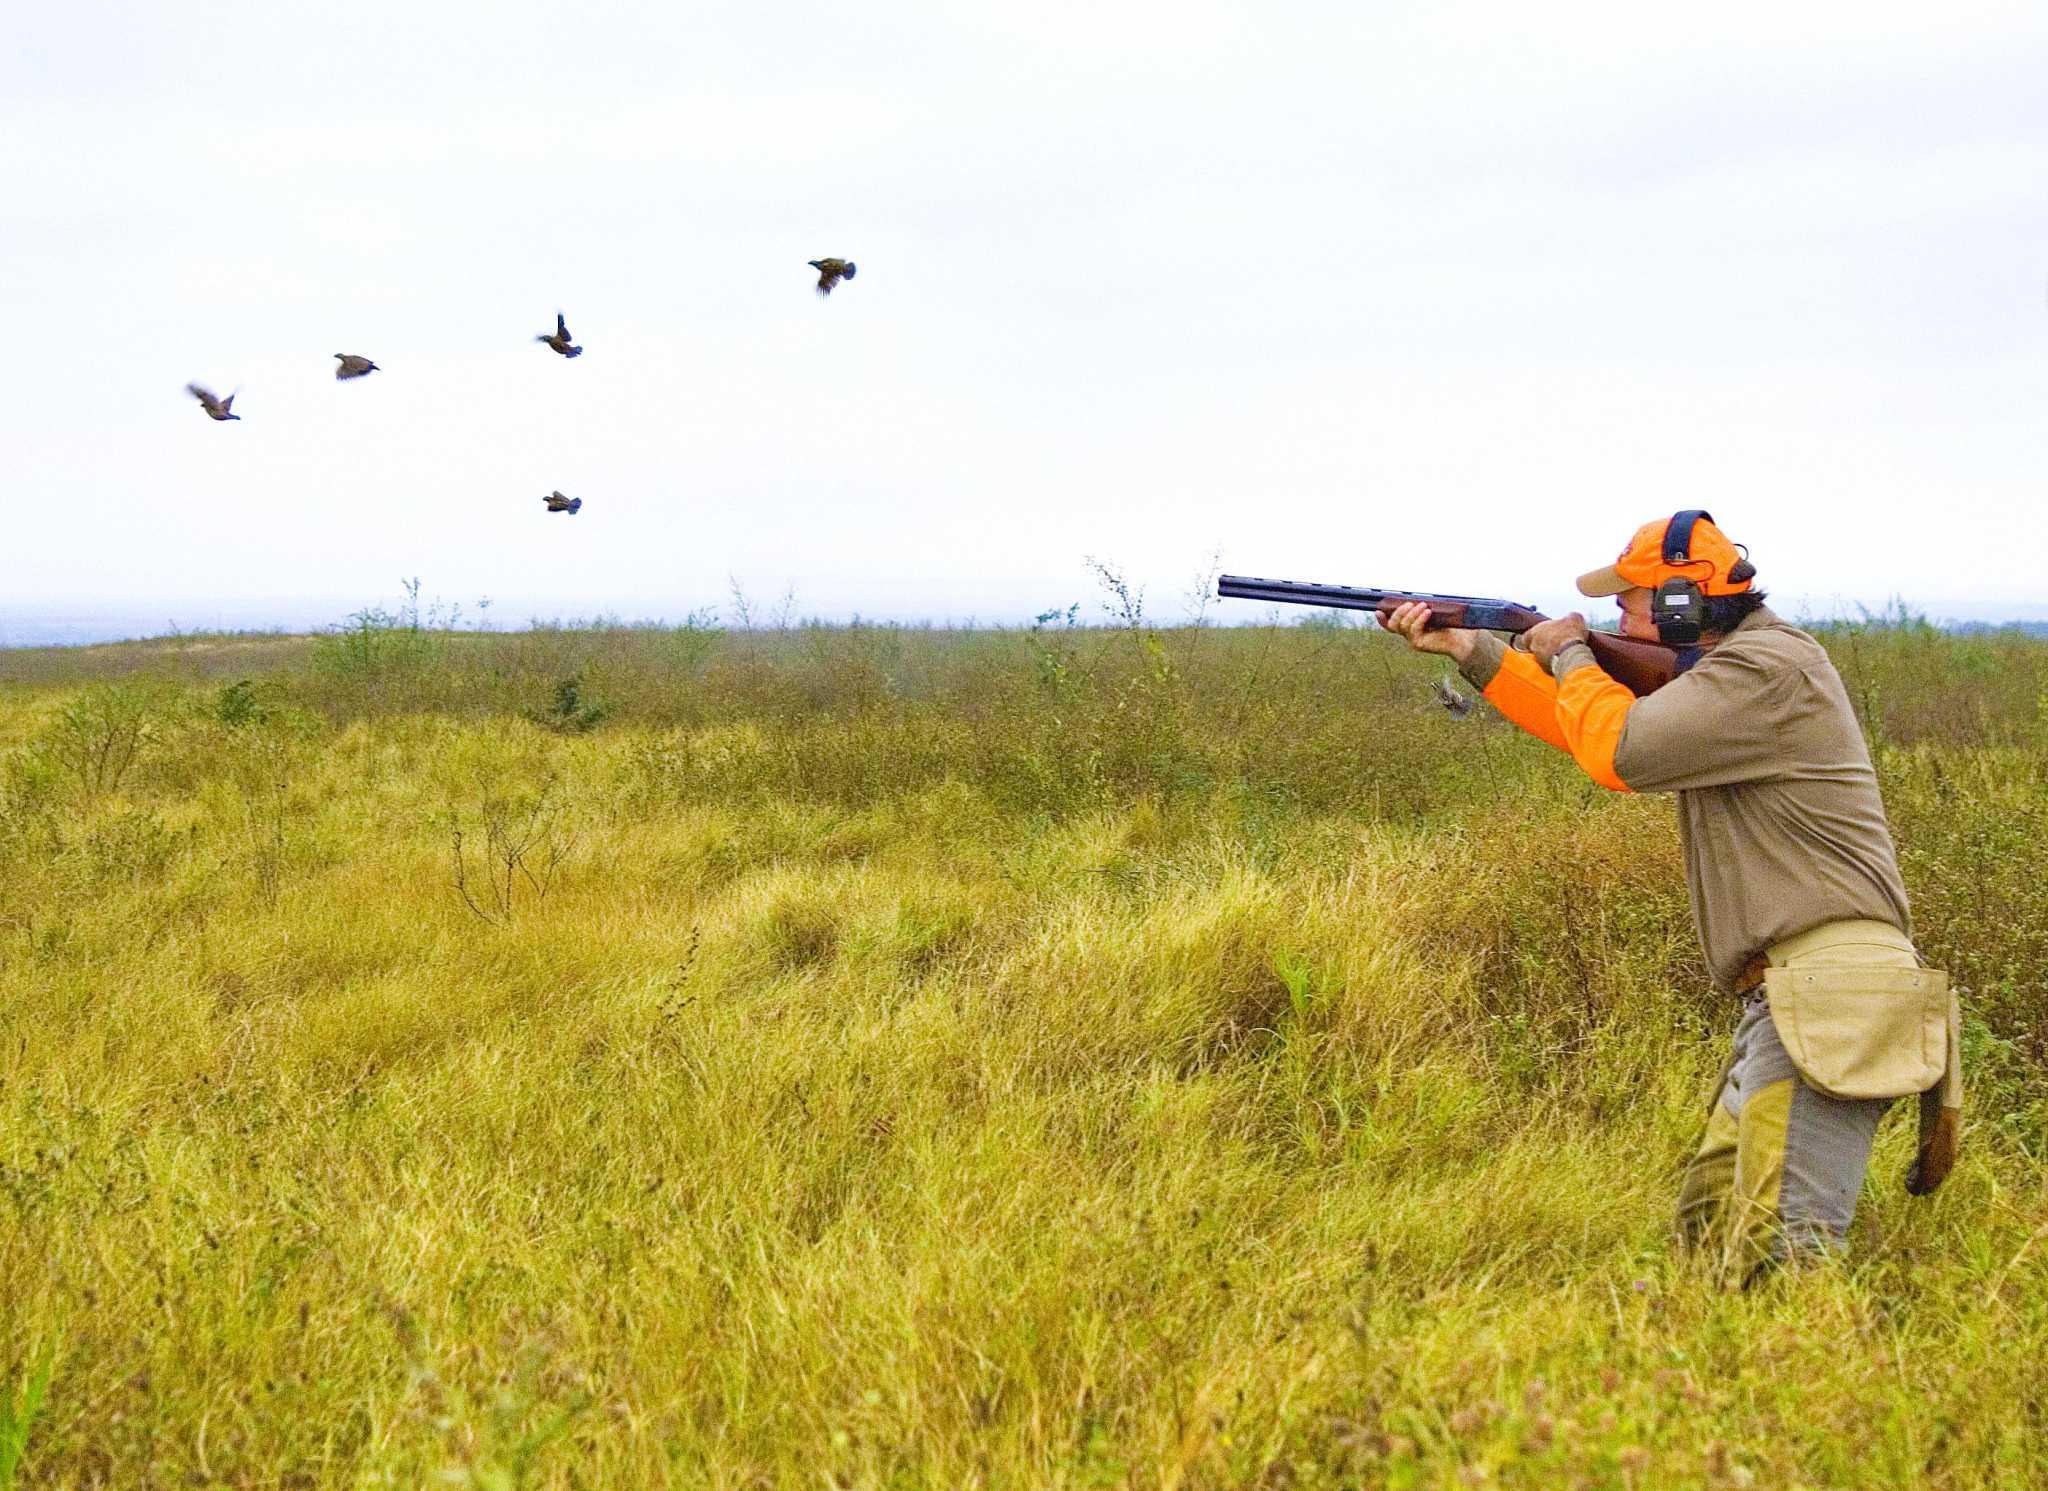 Texas quail rebounding after a dismal 2018